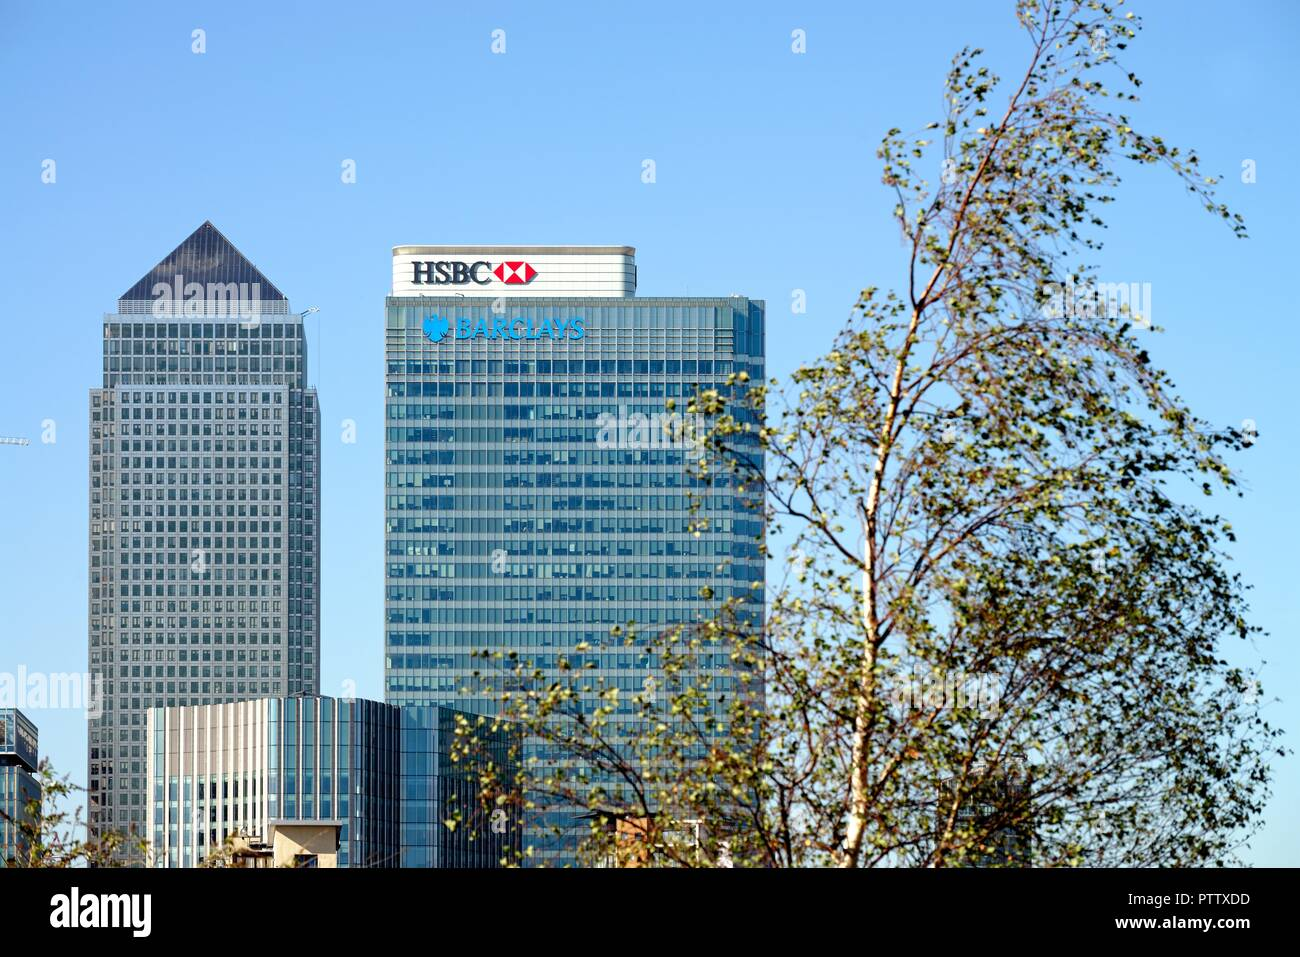 Banking headquarters at Canary Wharf London Docklands England UK - Stock Image